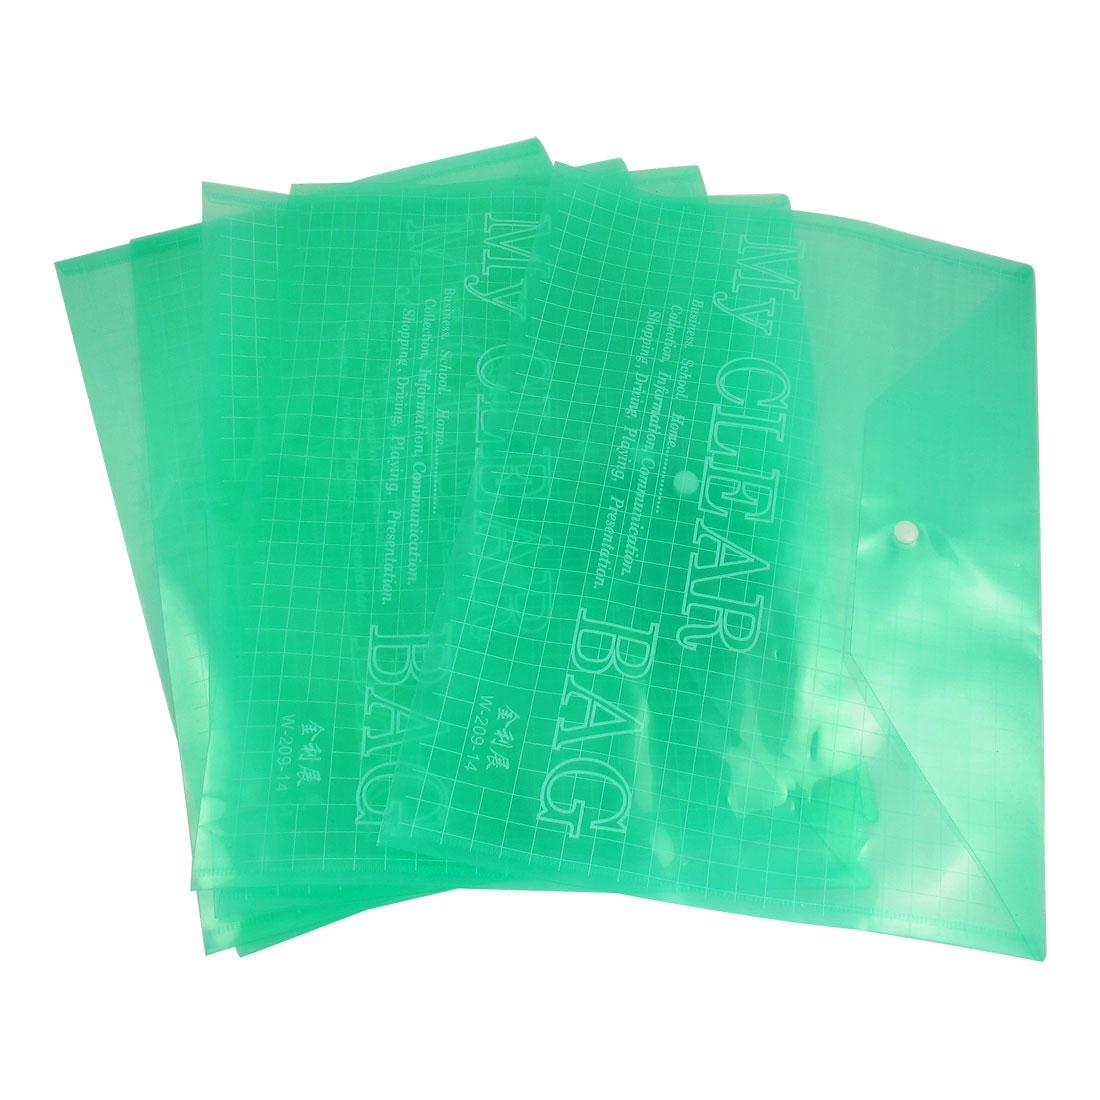 5PCS A9 Paper Clear Green Press Stud Closure Bags for File Folder